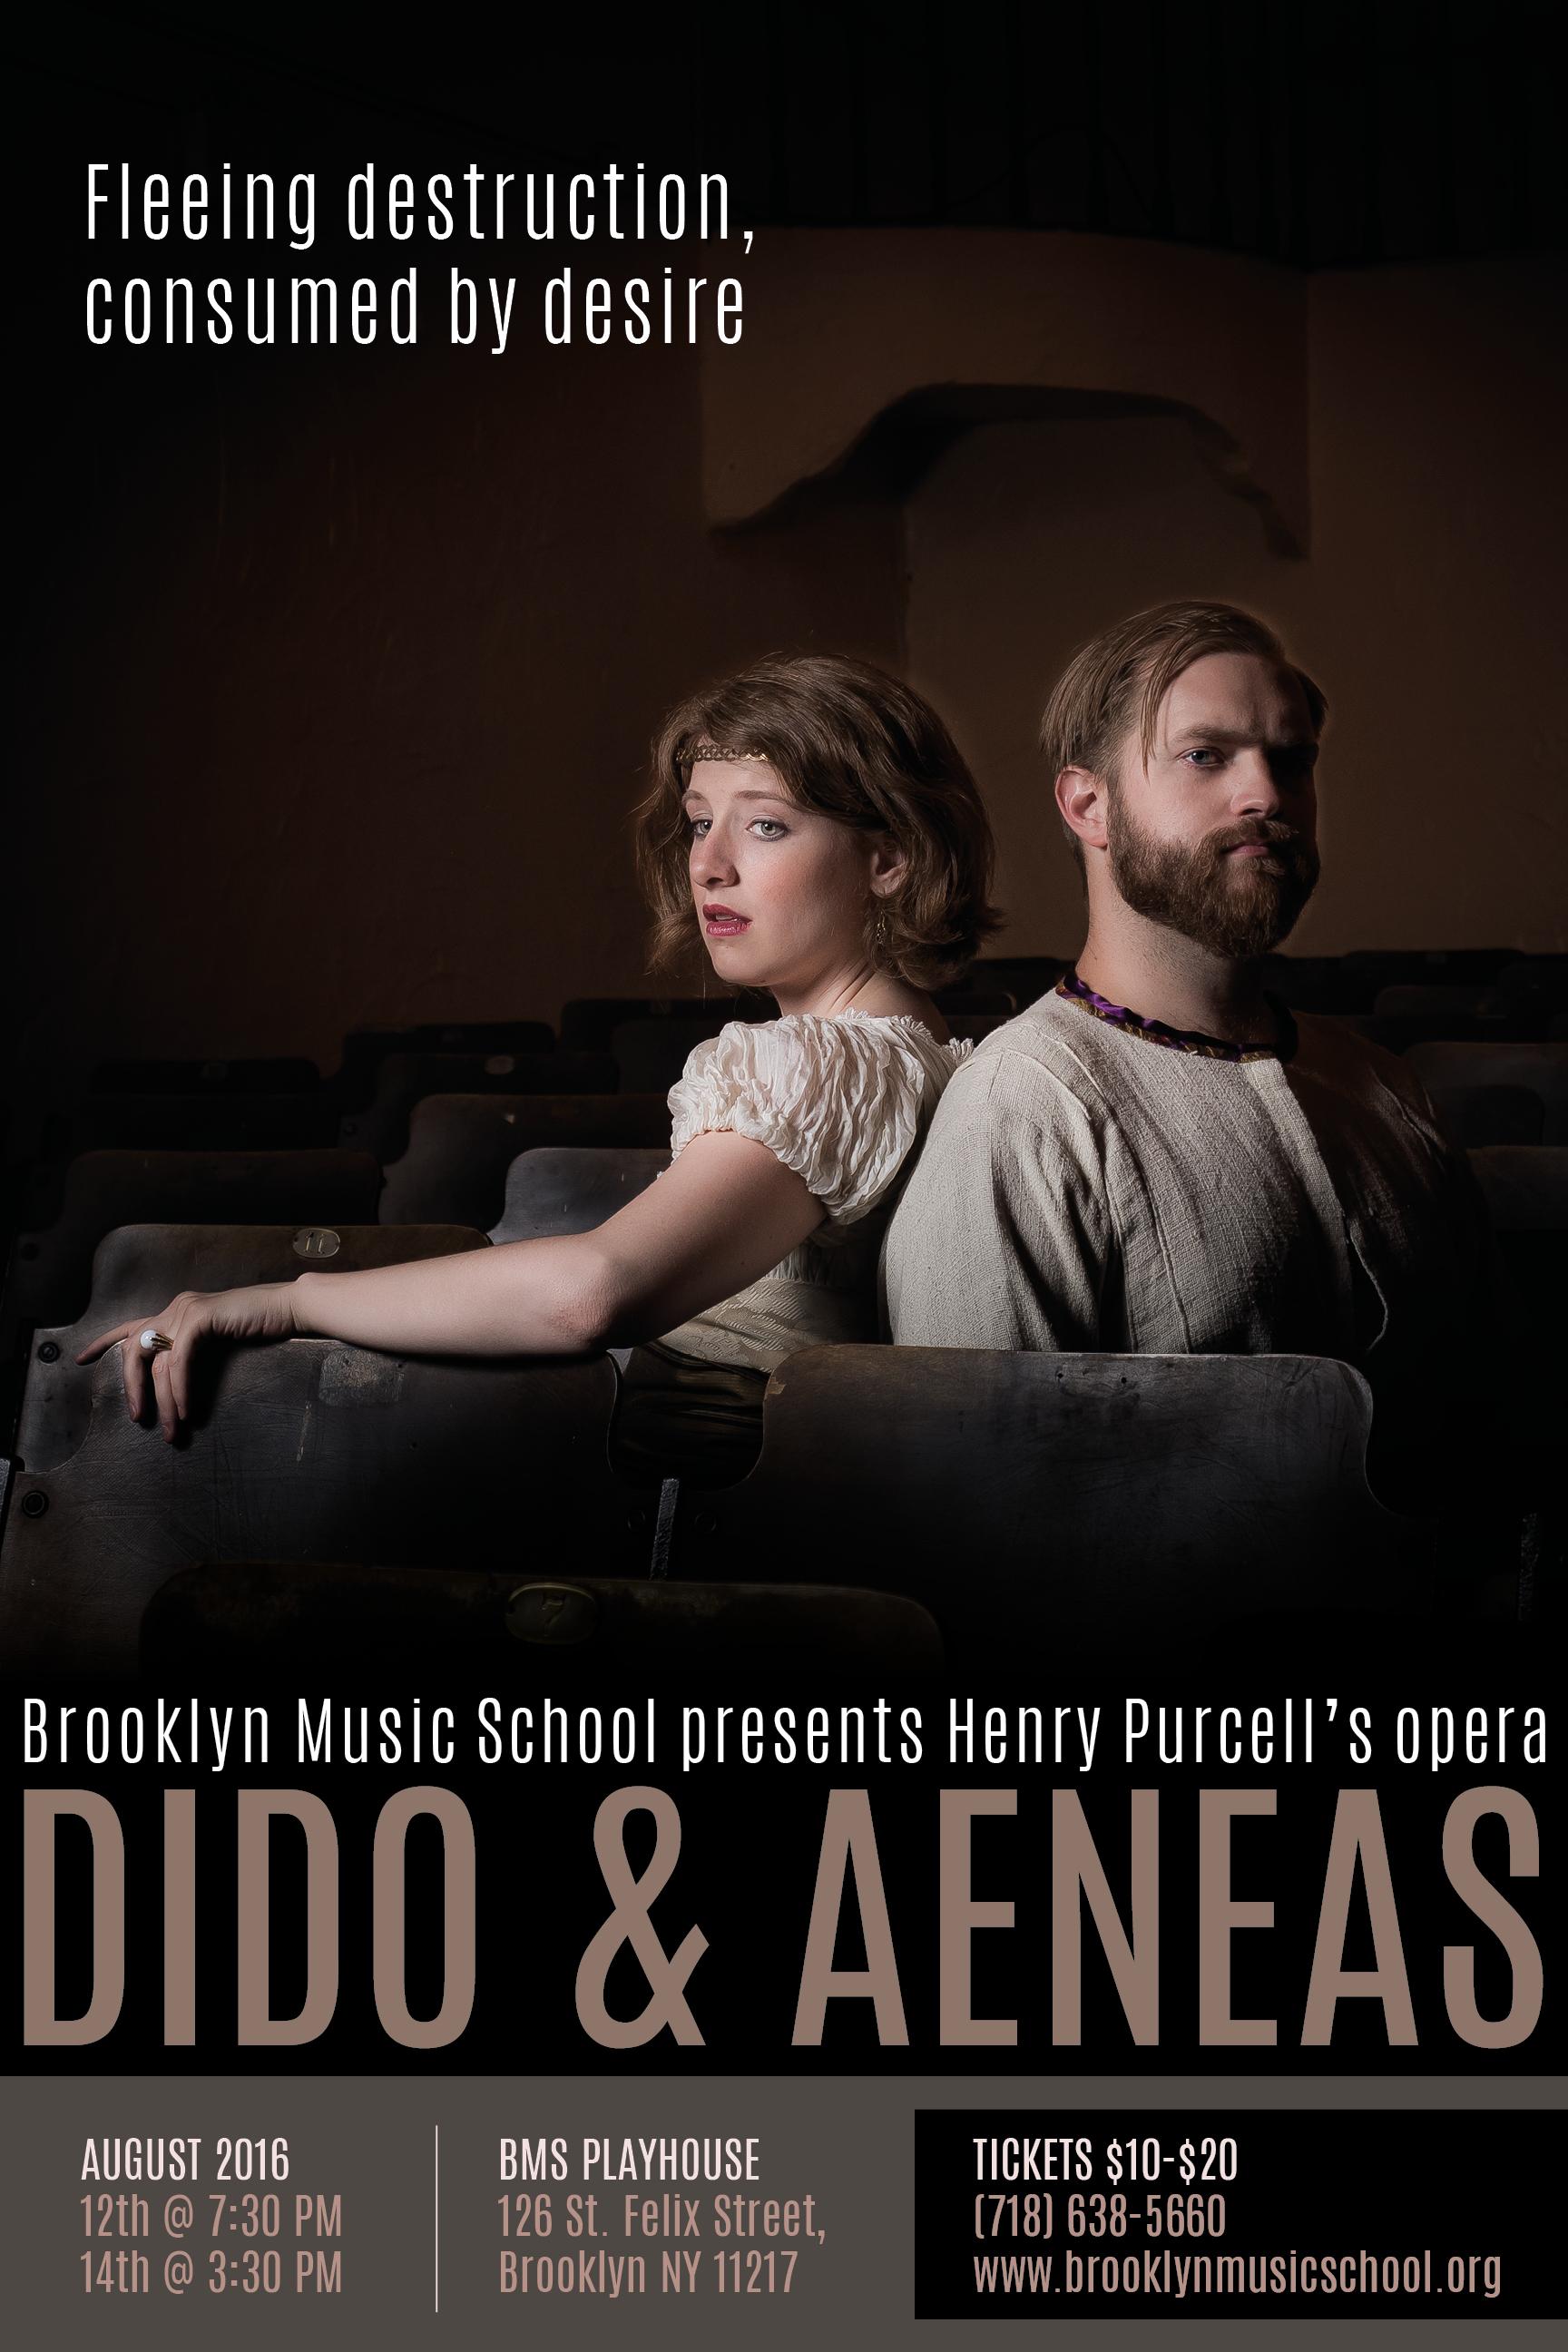 Dido-&-Aeneas-poster.jpg